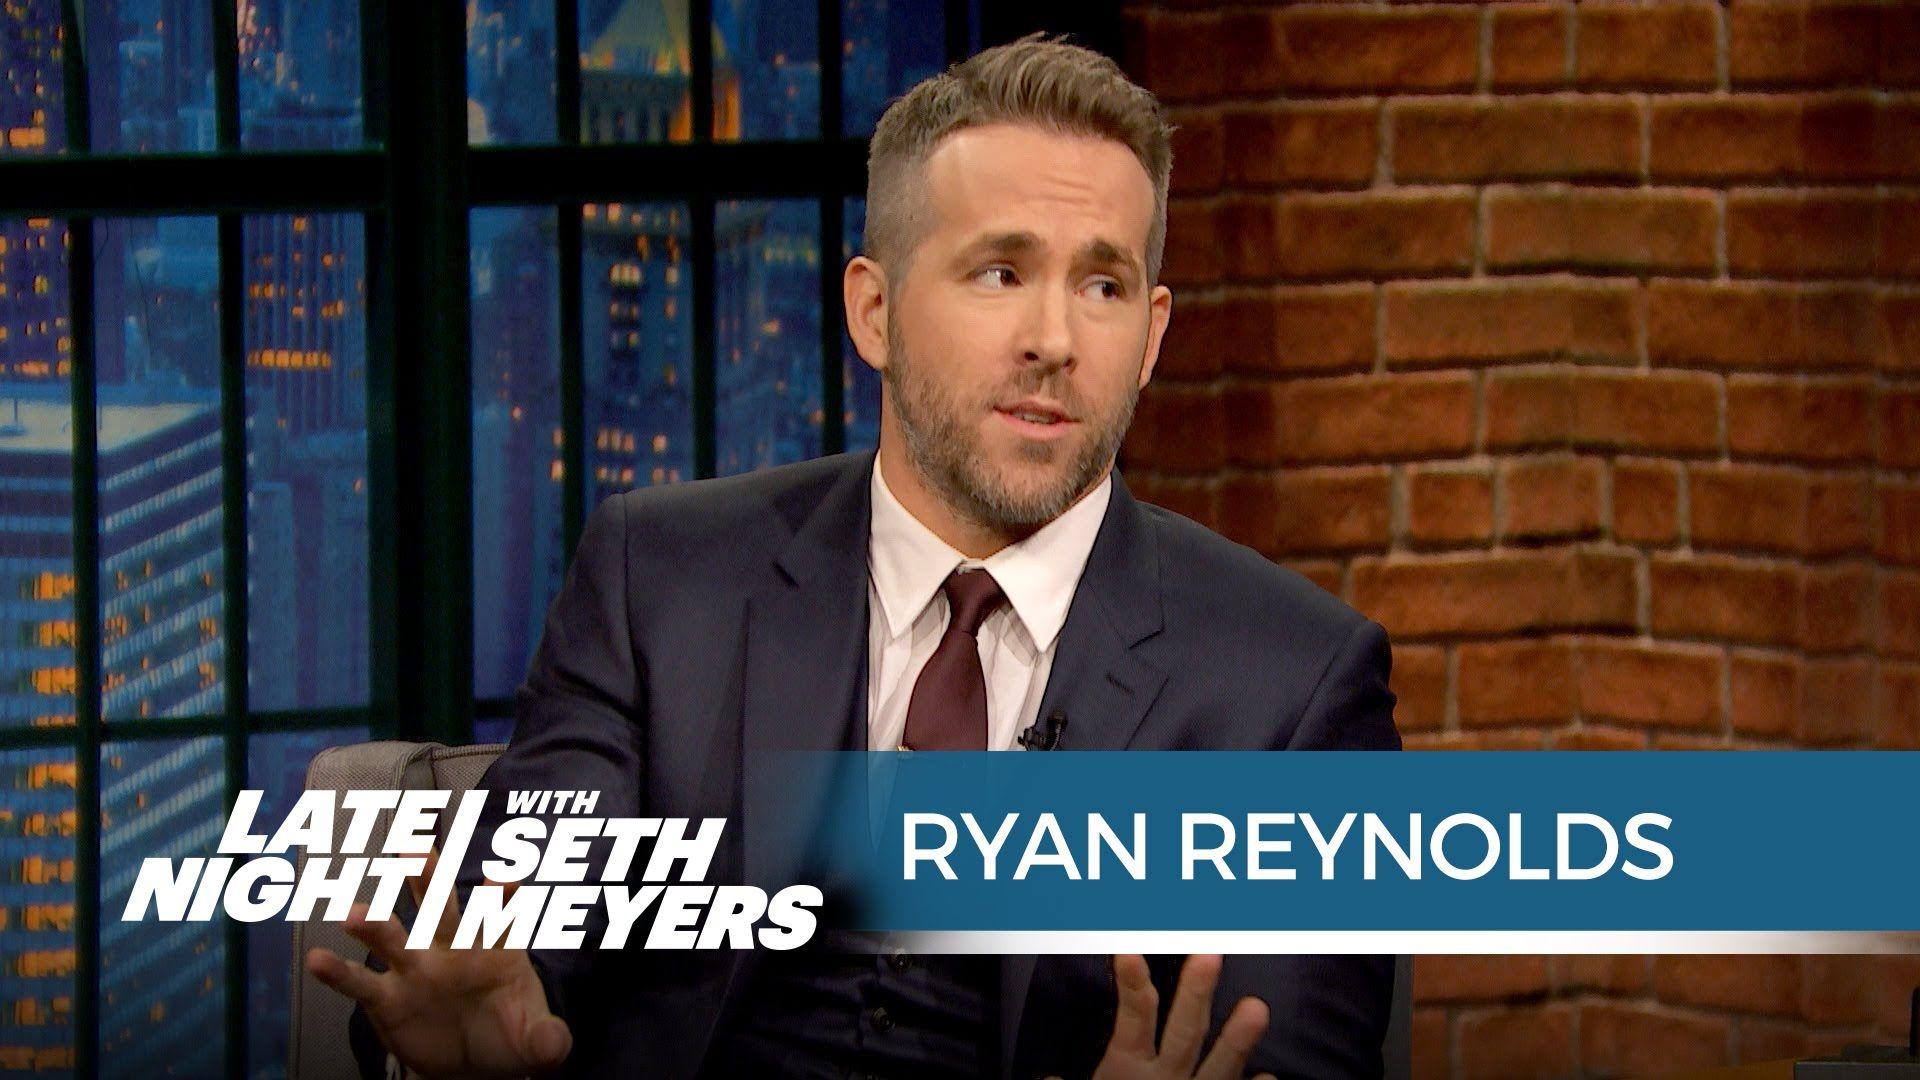 Delivery Room Seth Meyers Ryan Reynolds Late Nights Blake Lively Dj